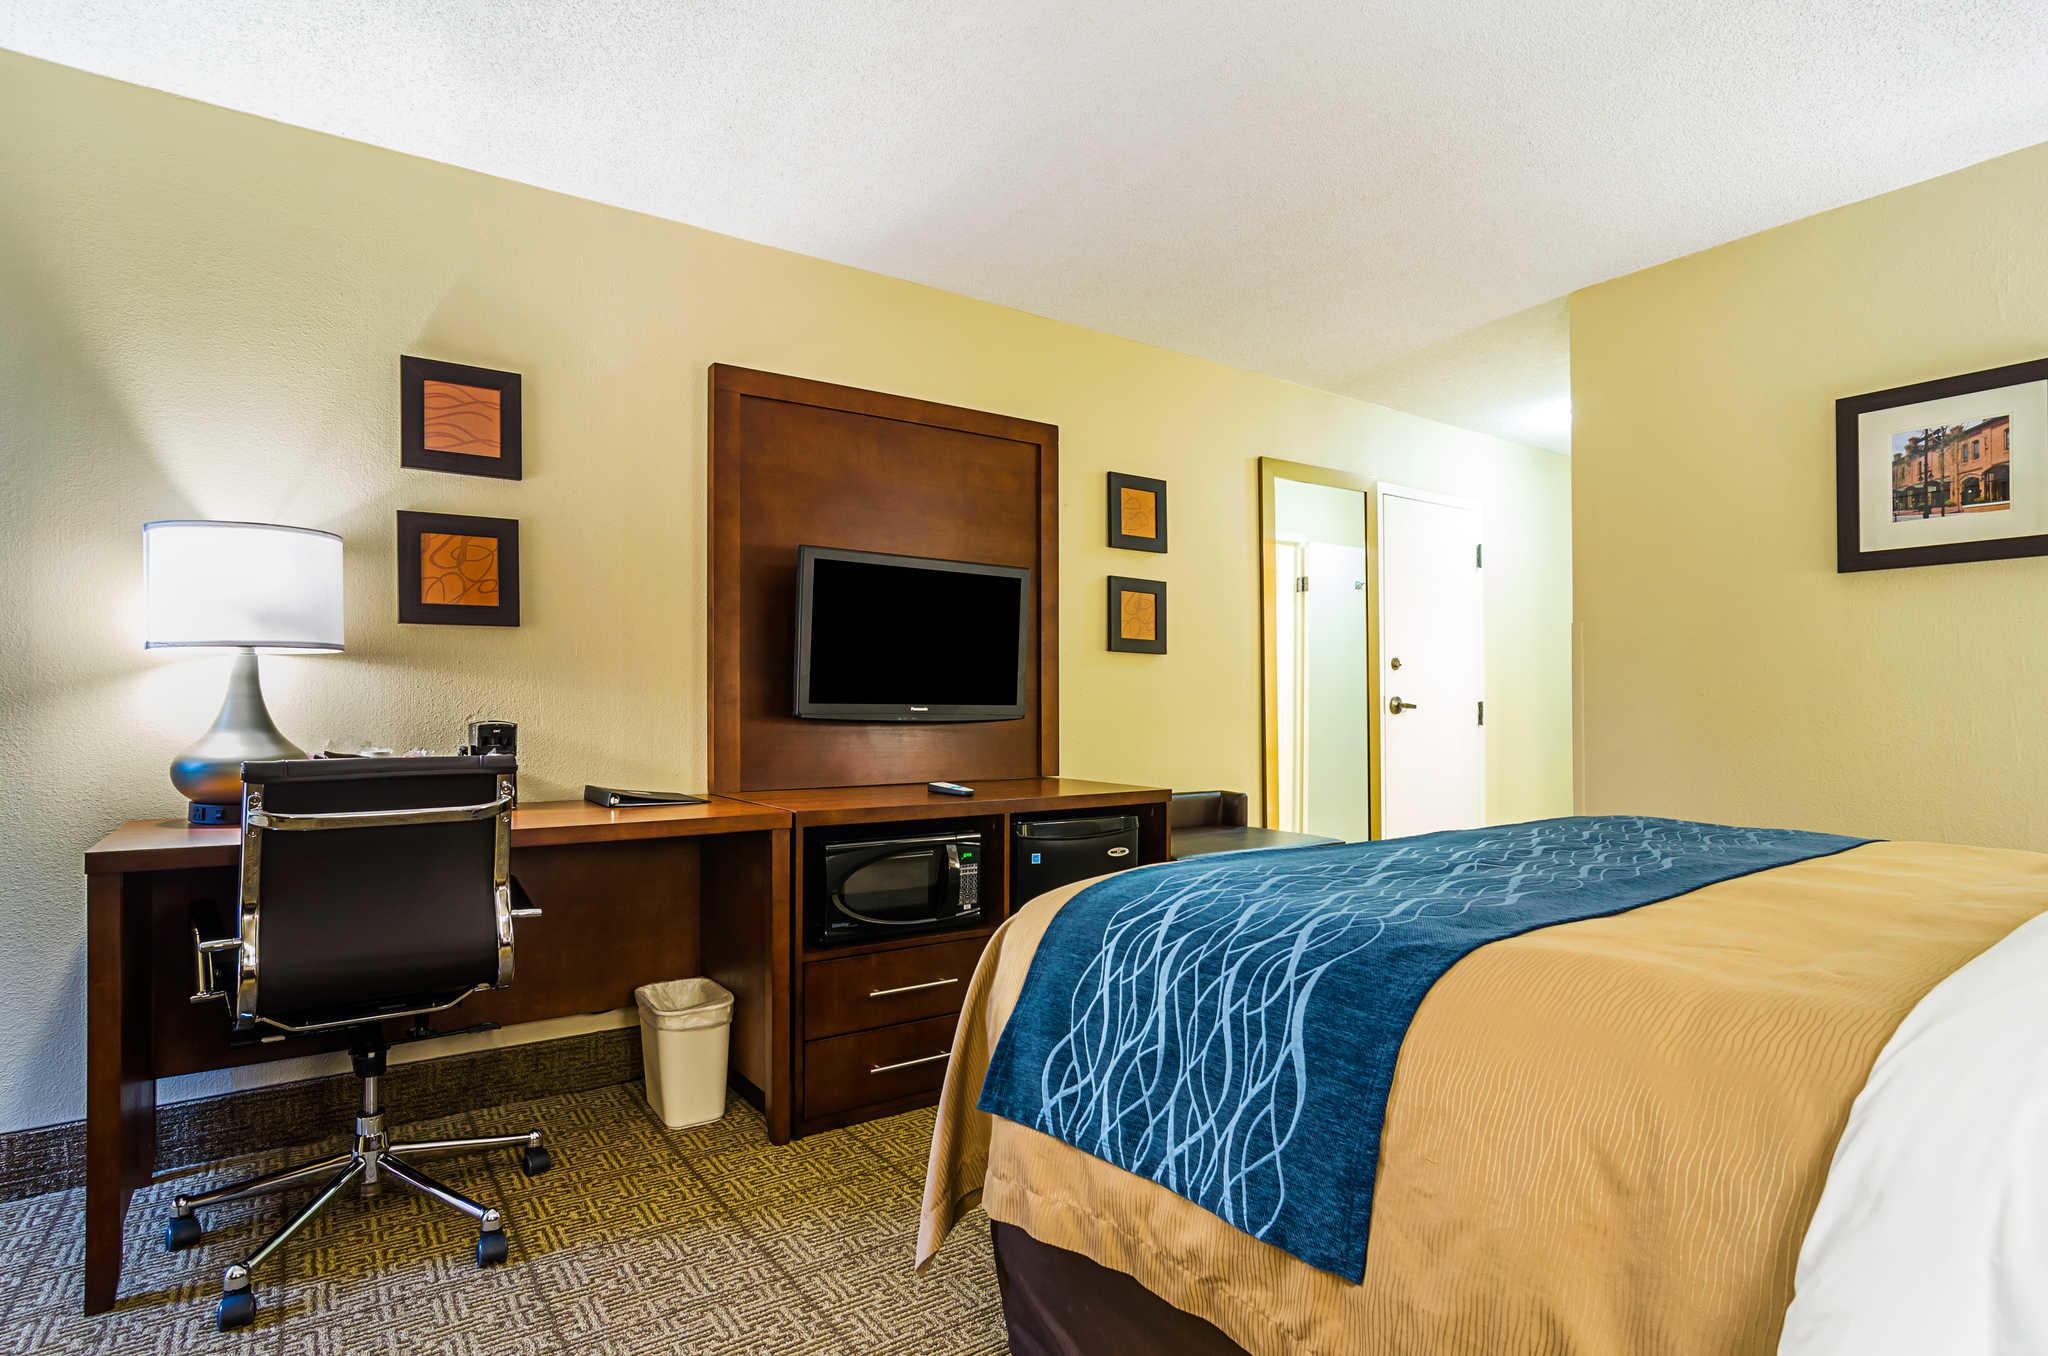 Comfort Inn & Suites Duke University-Downtown image 16